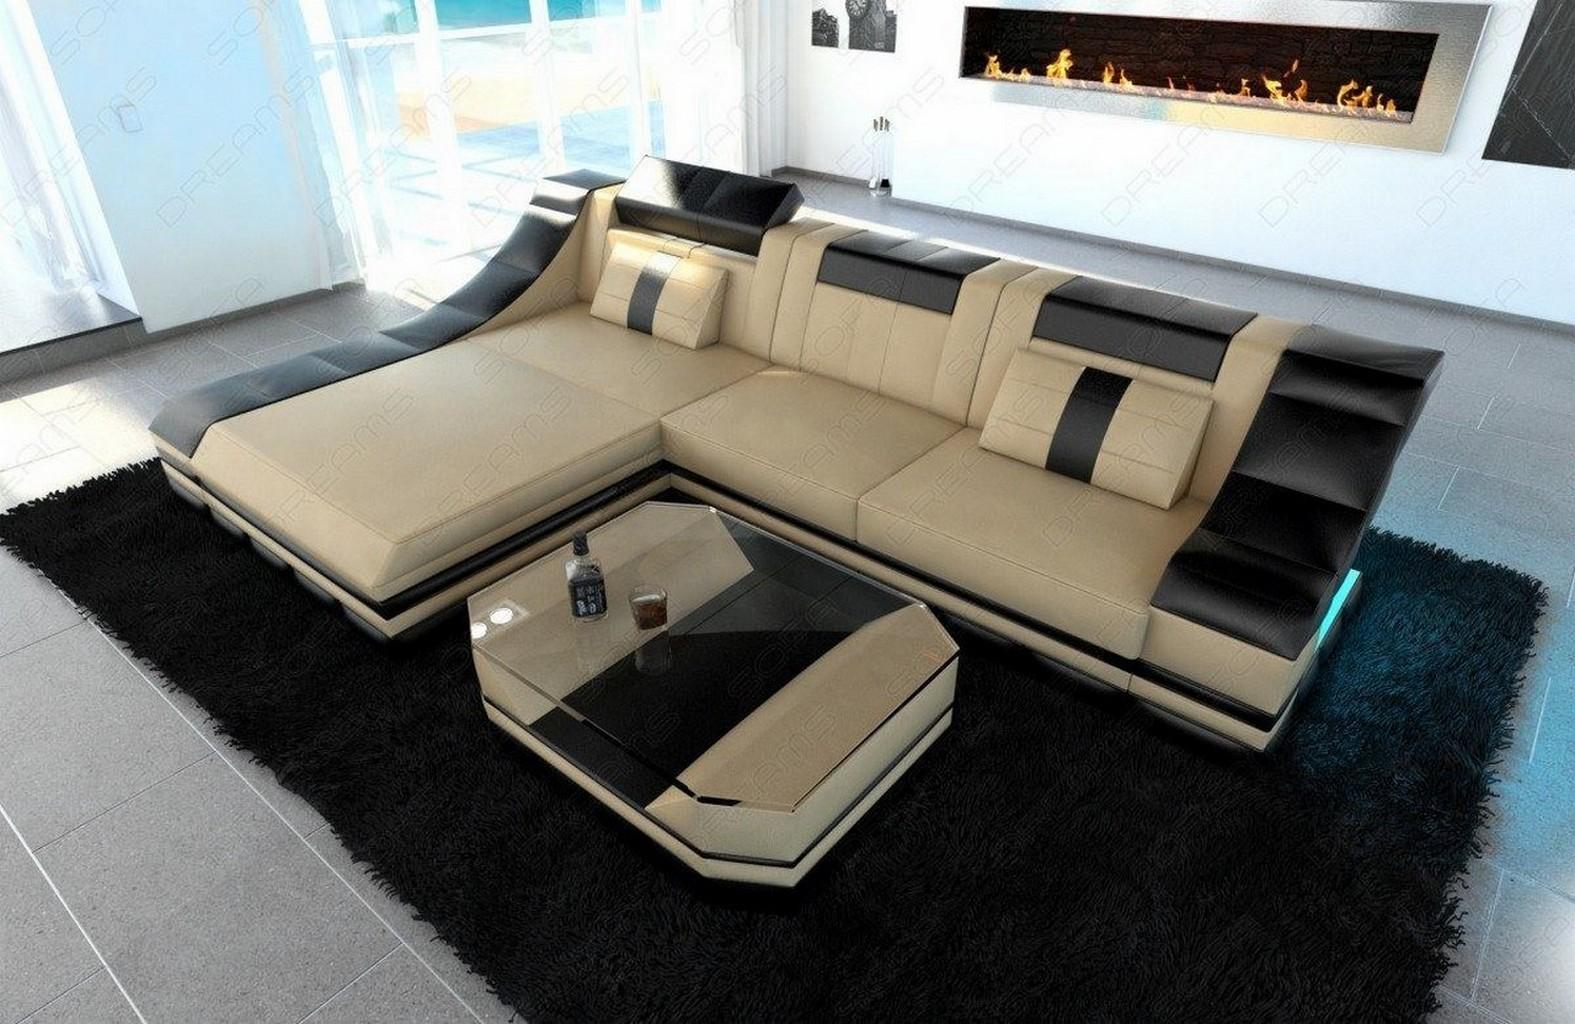 sofagarnitur ledersofa turino l form mit led licht eckcouch sandbeige schwarz ebay. Black Bedroom Furniture Sets. Home Design Ideas